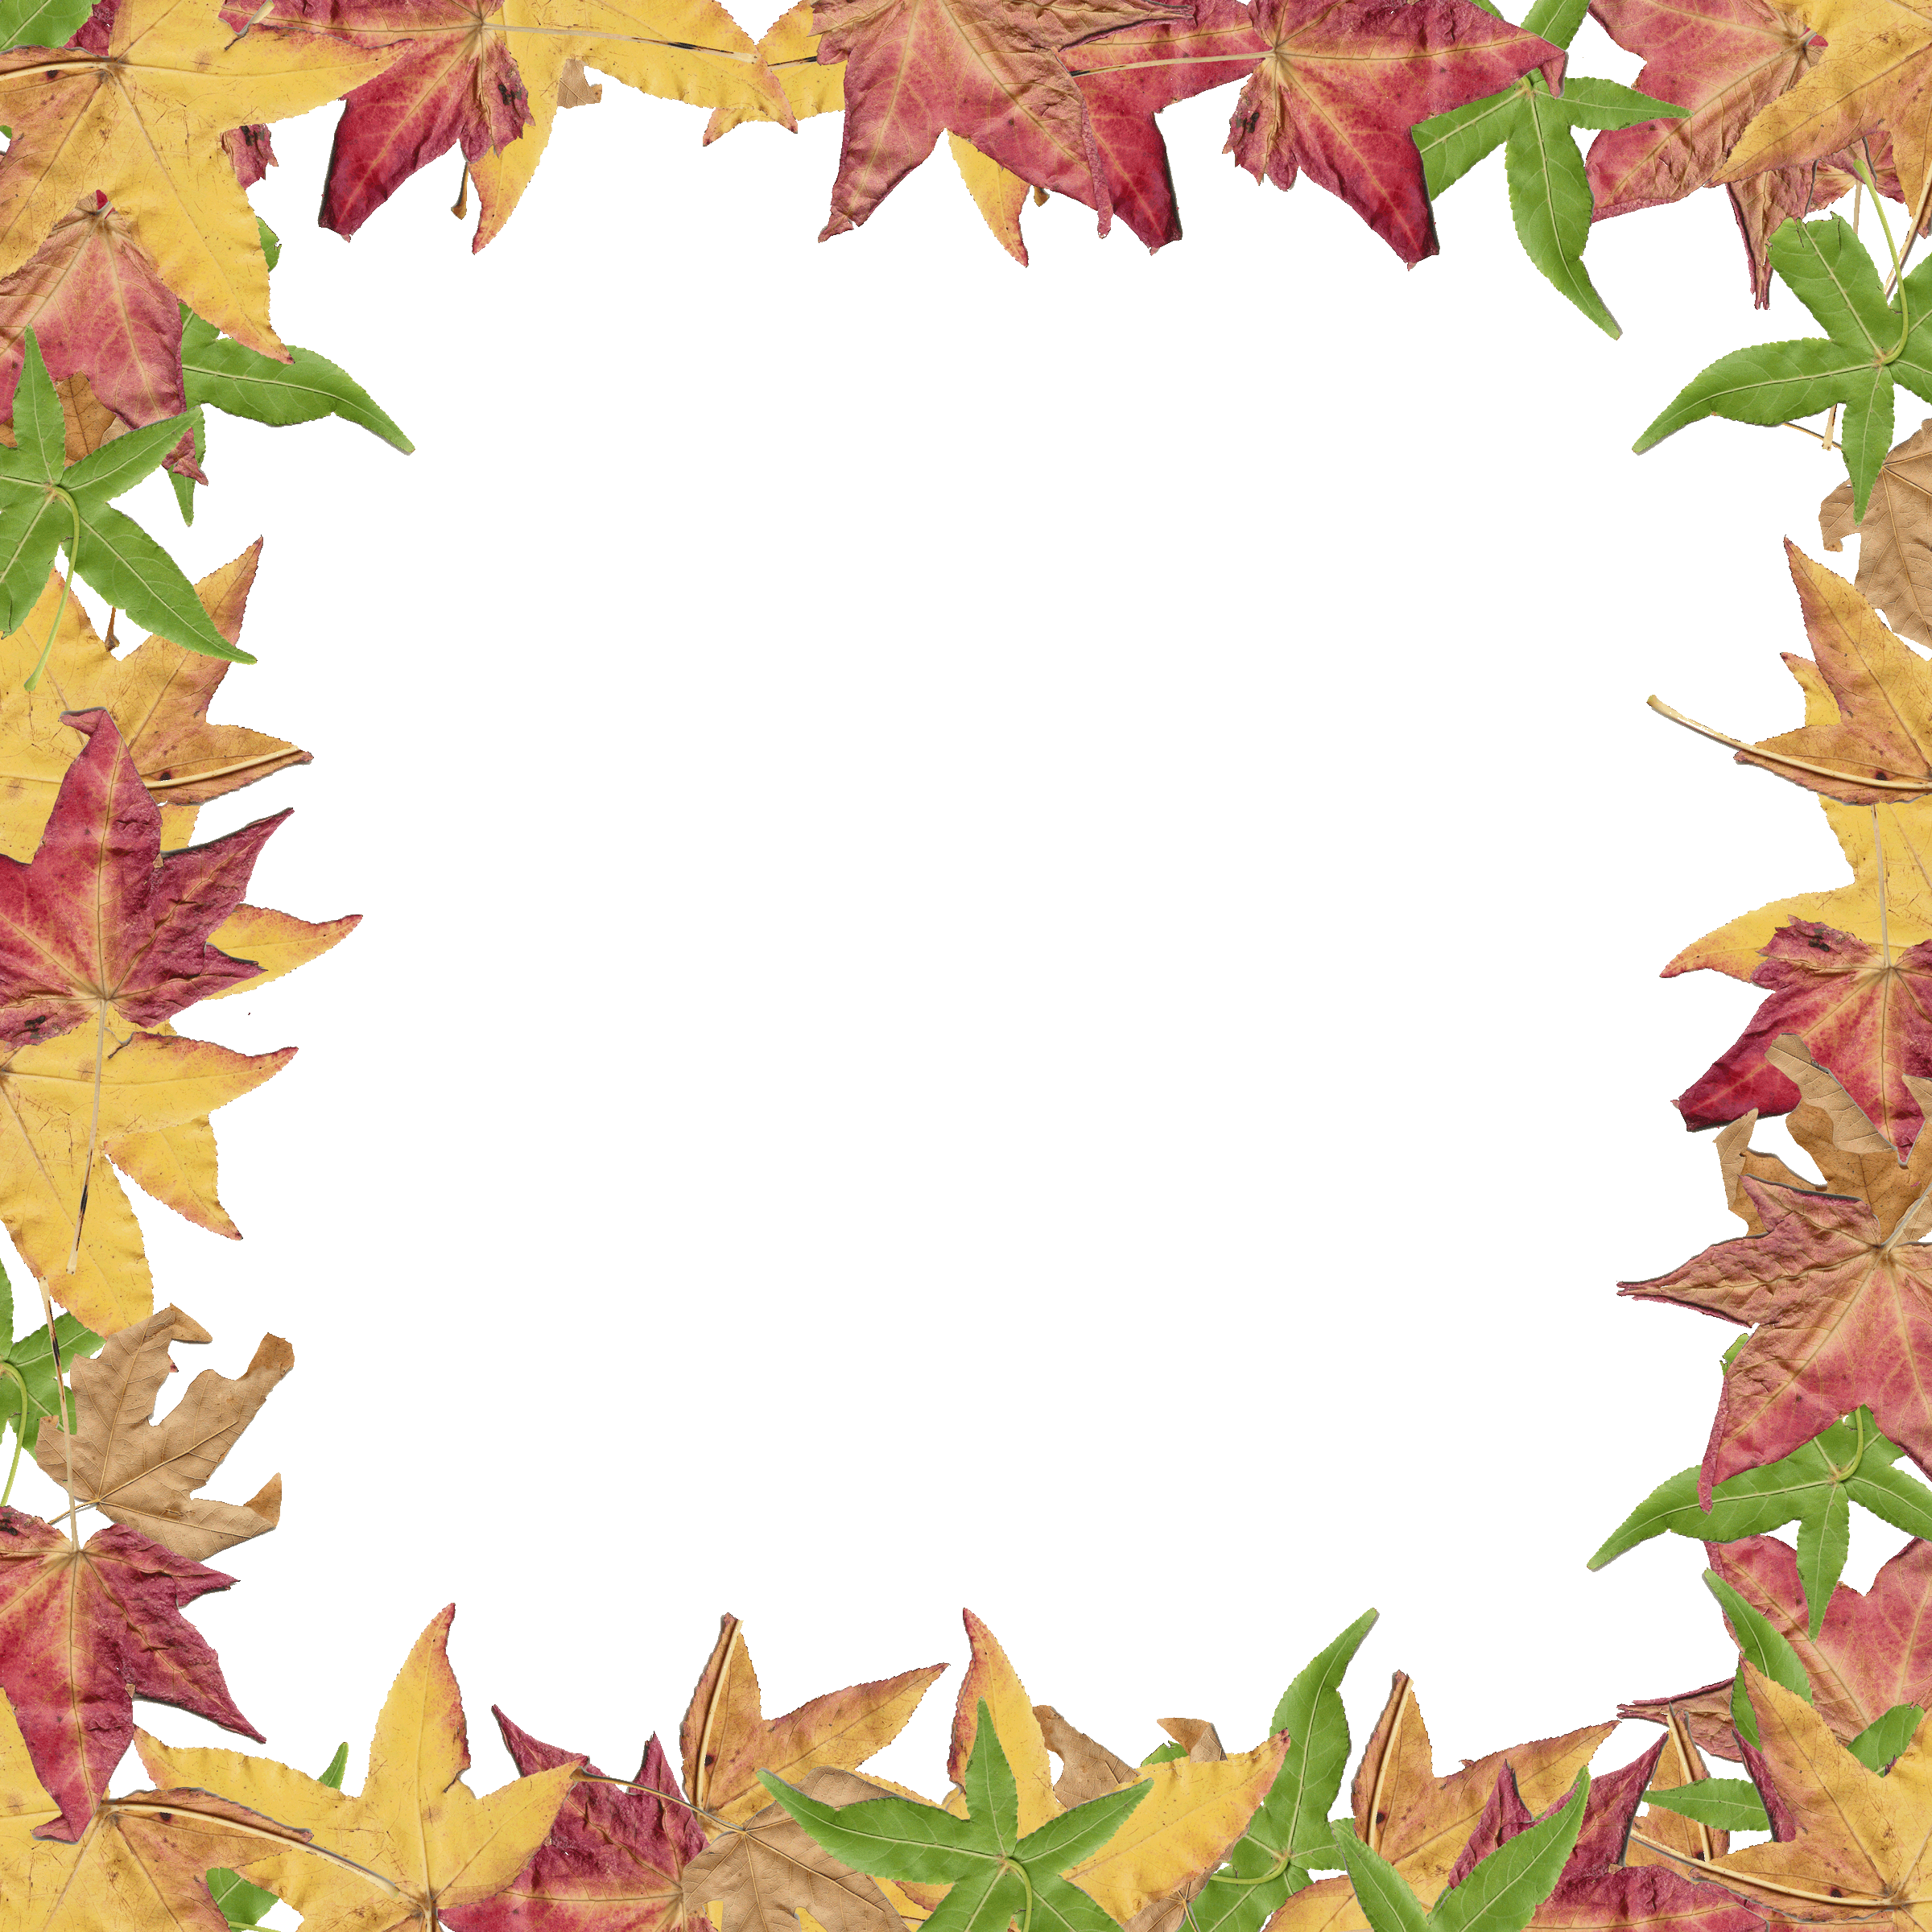 2400x2400 Fall Border Fall Leaves Clip Art Image 4